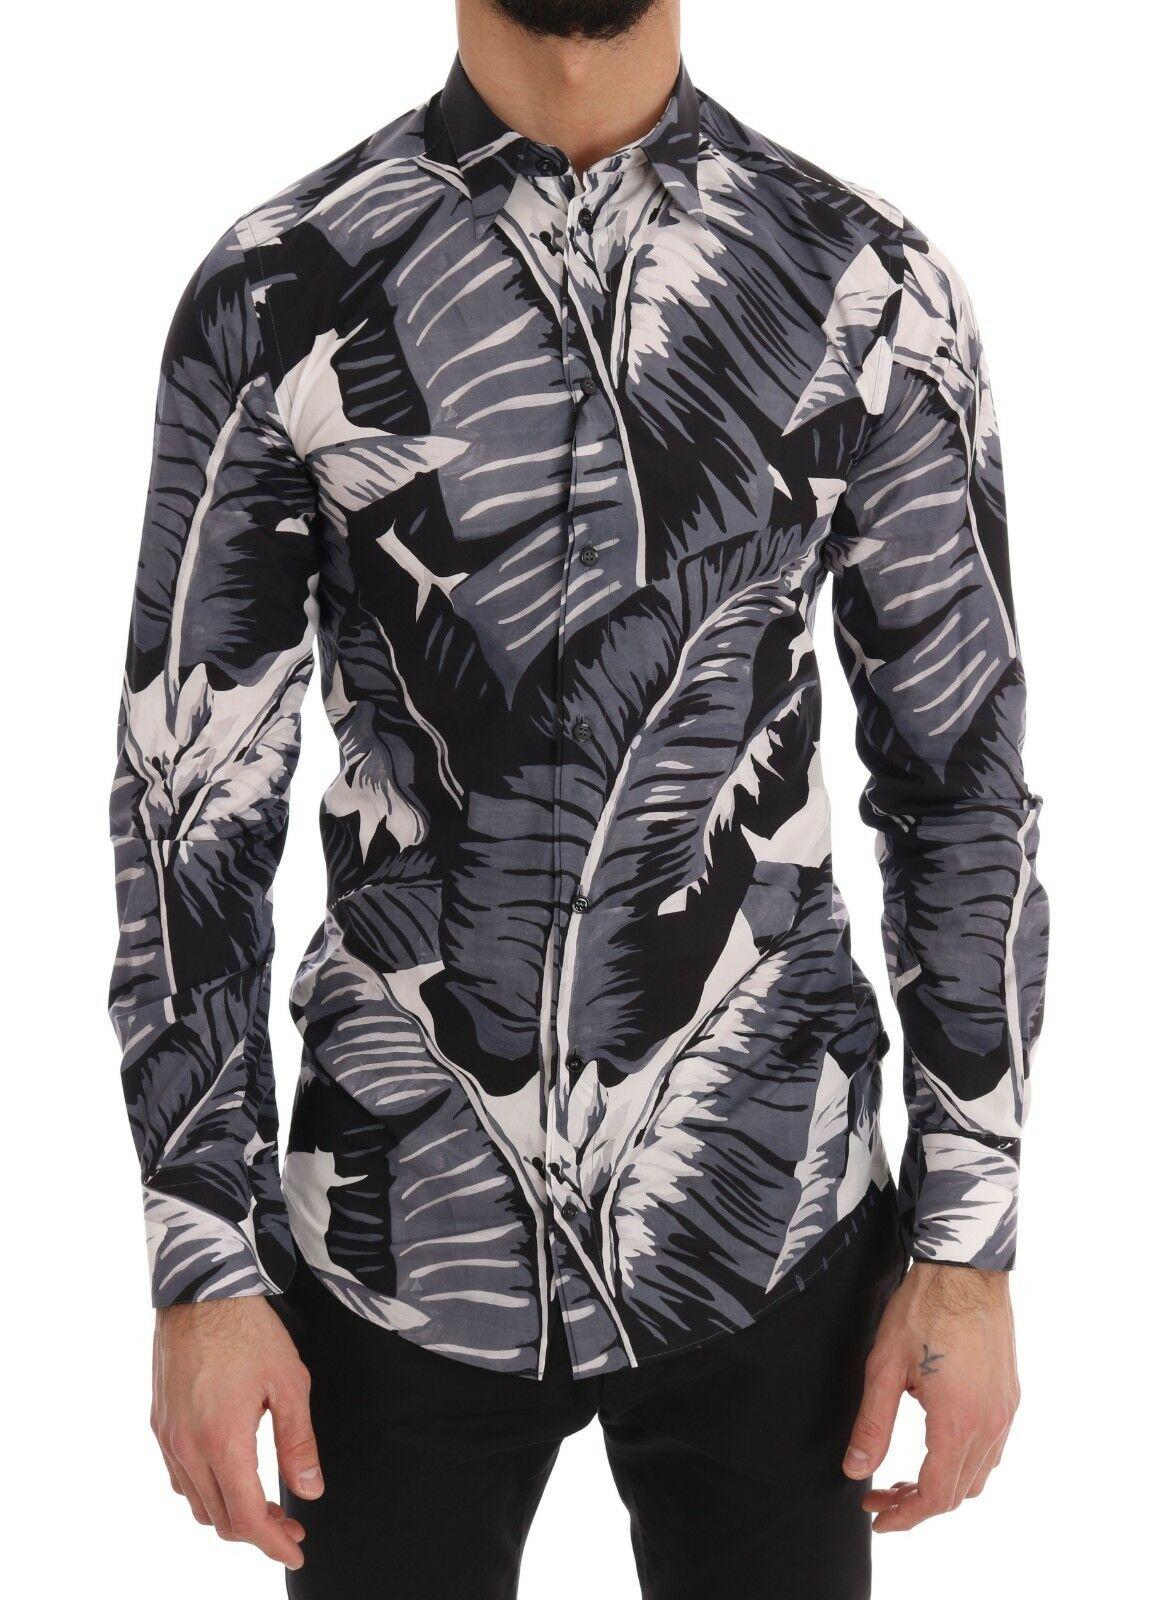 Dolce & Gabbana Men's Banana Leaf Slim Fit Shirt Blue TSH2568 - IT37 | XS